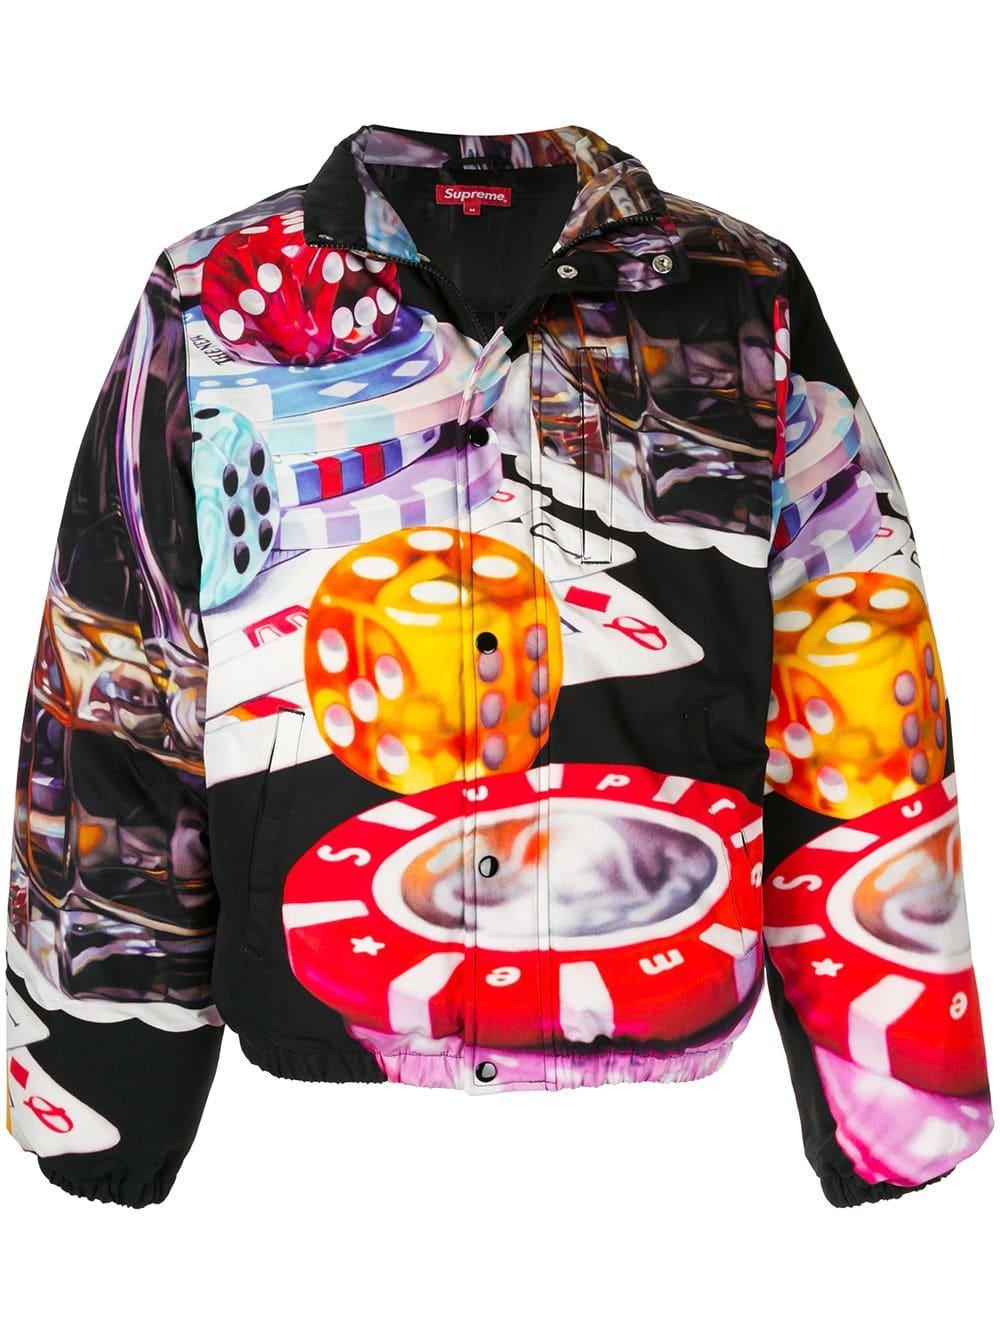 Supreme Casino Print Puffer Jacket In Black Modesens Puffer Jacket Black Streetwear Brands Jackets [ 1334 x 1000 Pixel ]